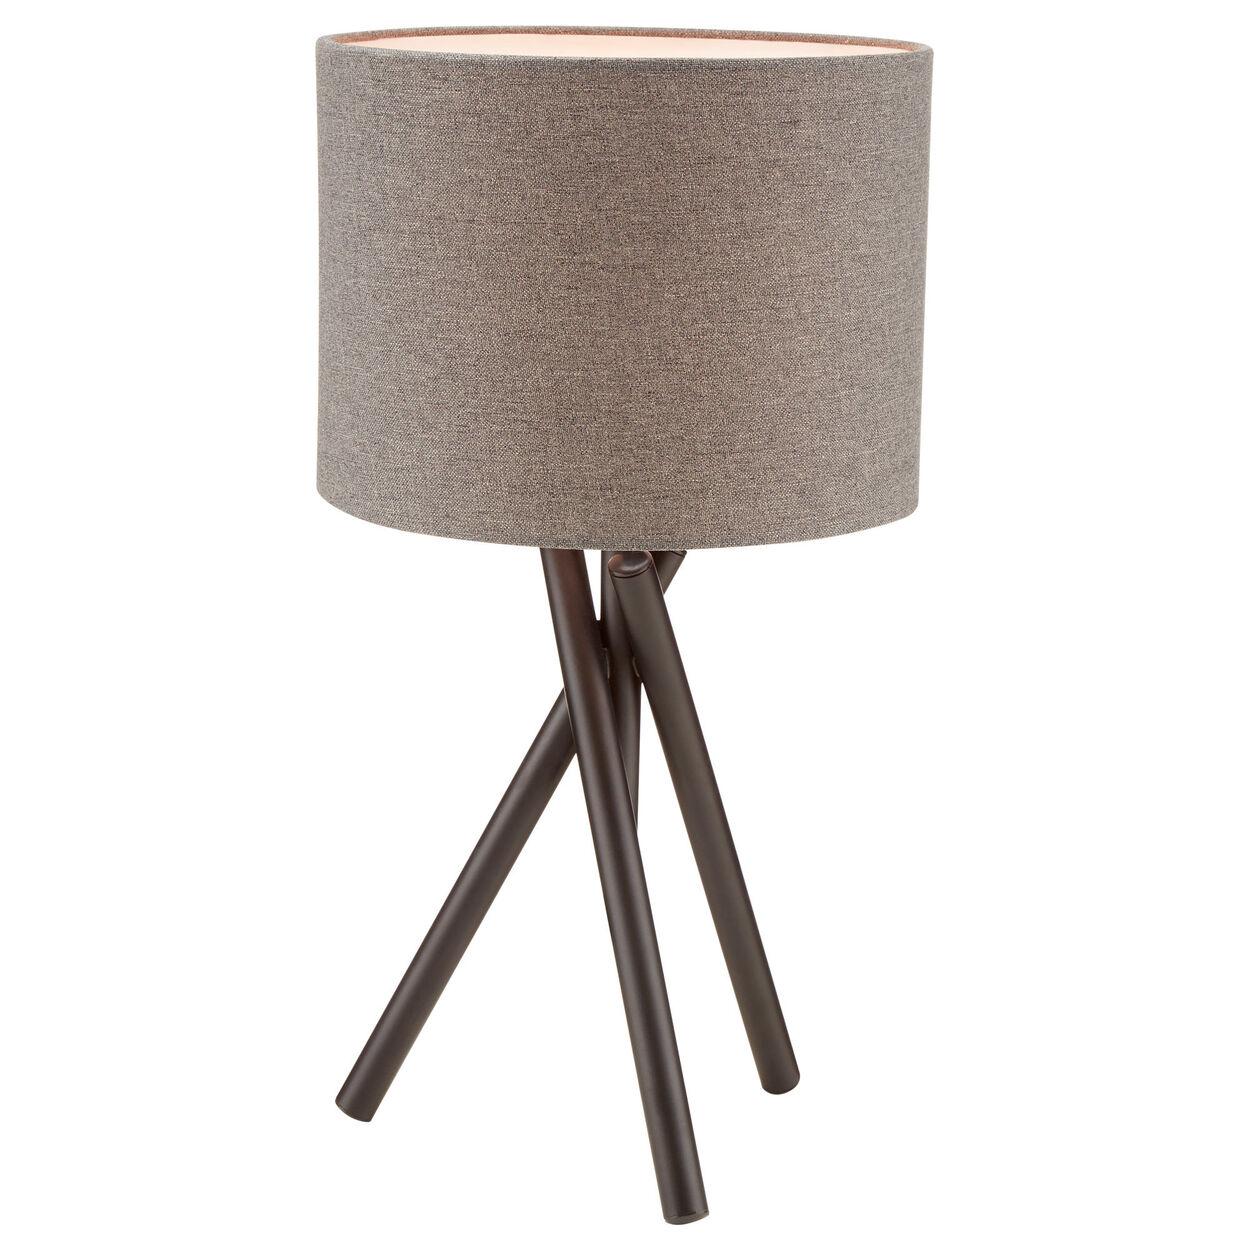 Three-Leg Metal Table Lamp